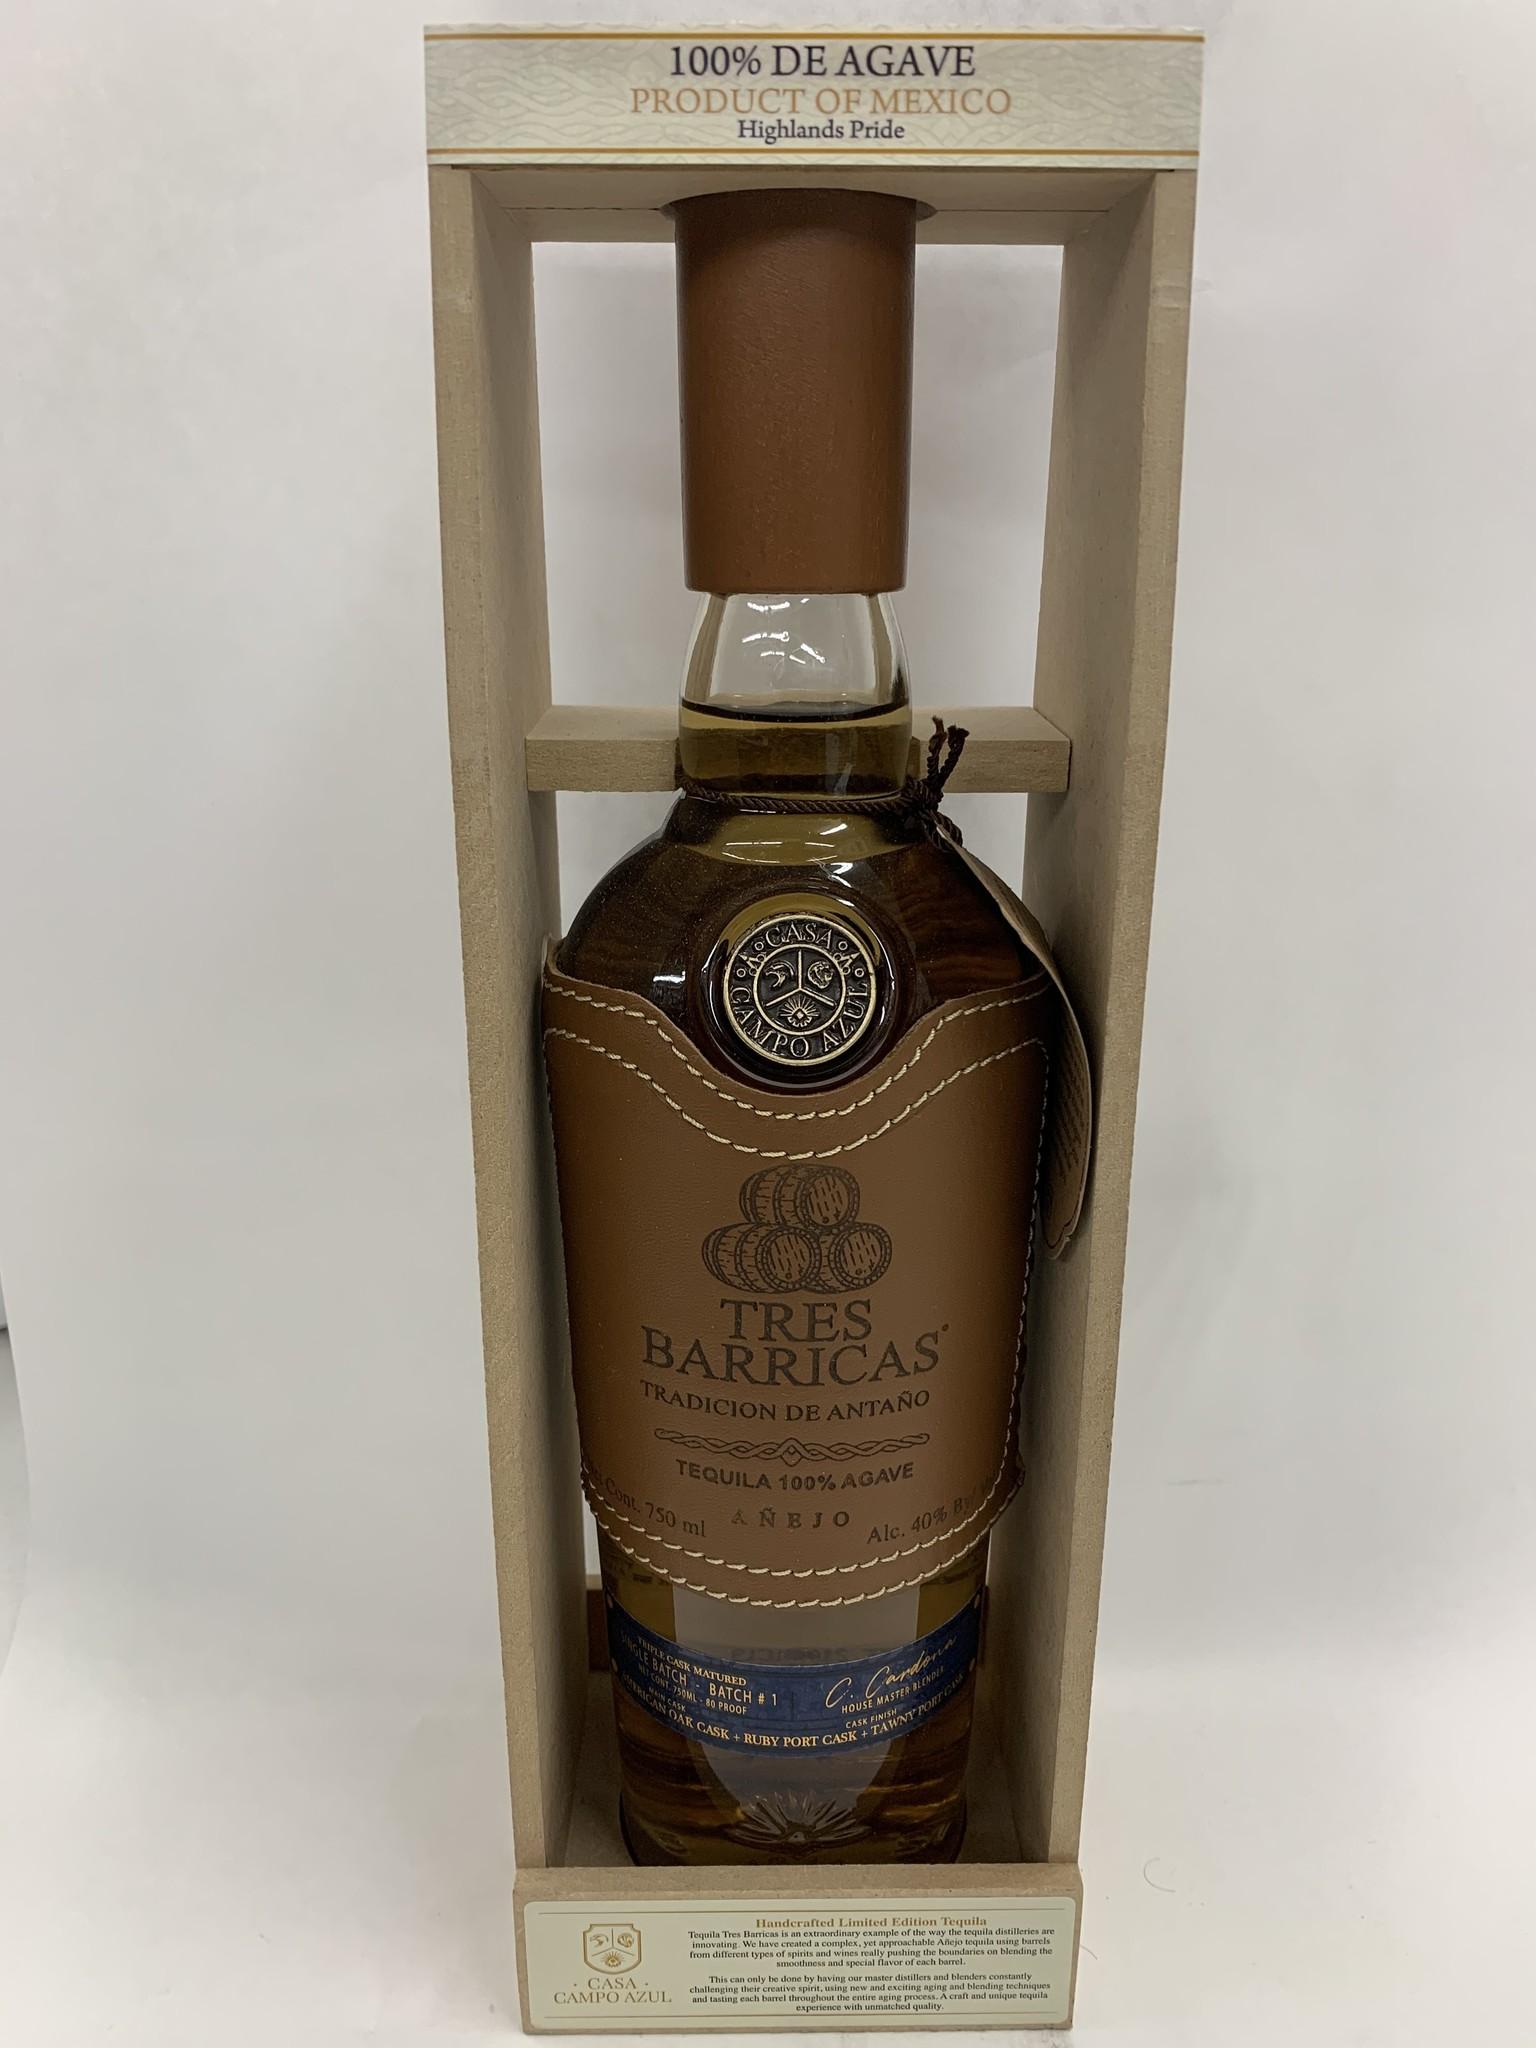 Tres Barricas Tradicion De Antano Anejo Tequila 750ml